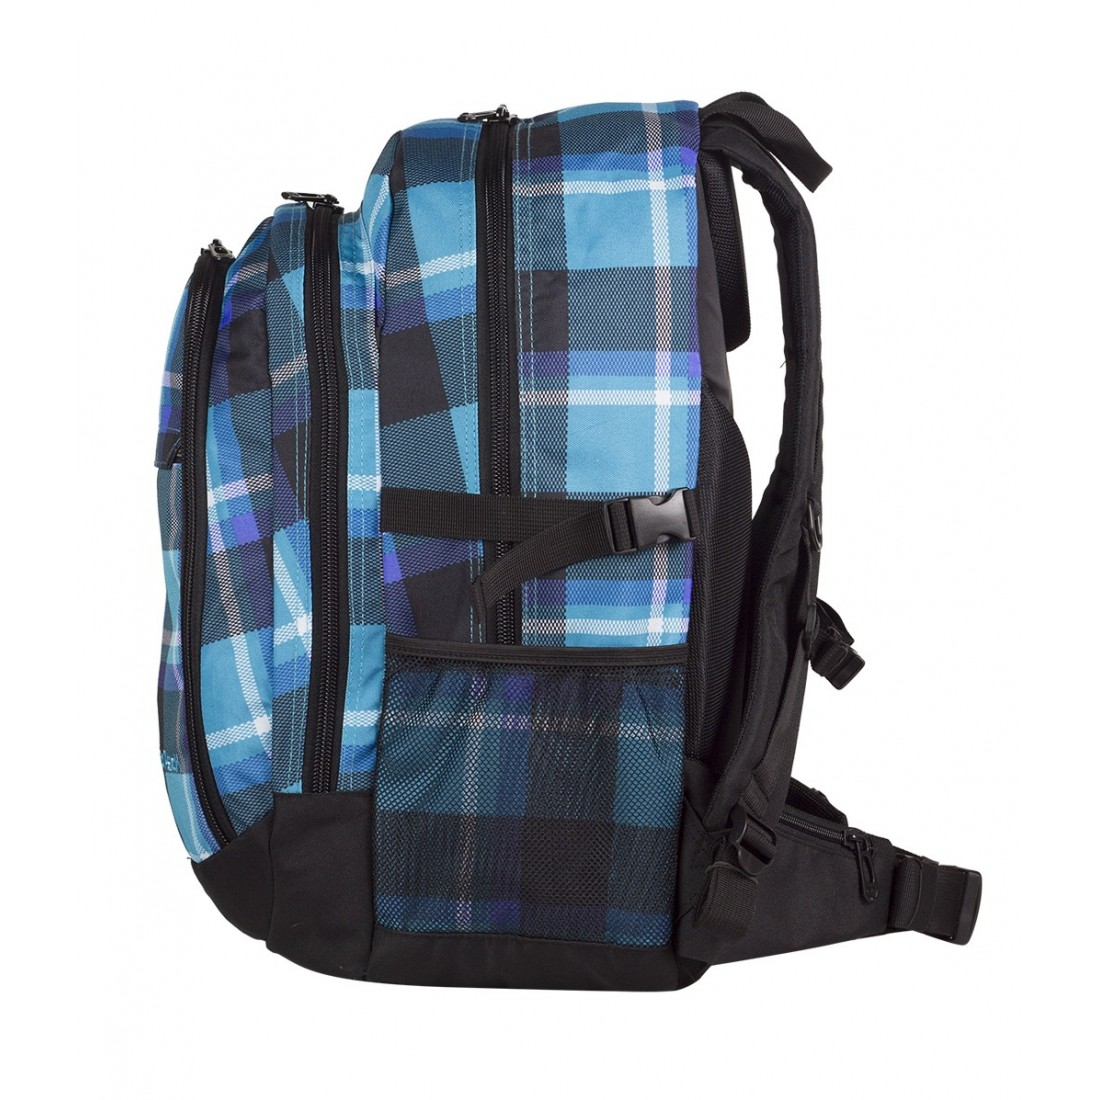 Duży plecak młodzieżowy CoolPack 384 Grand Scott dla chłopaka - plecak-tornister.pl